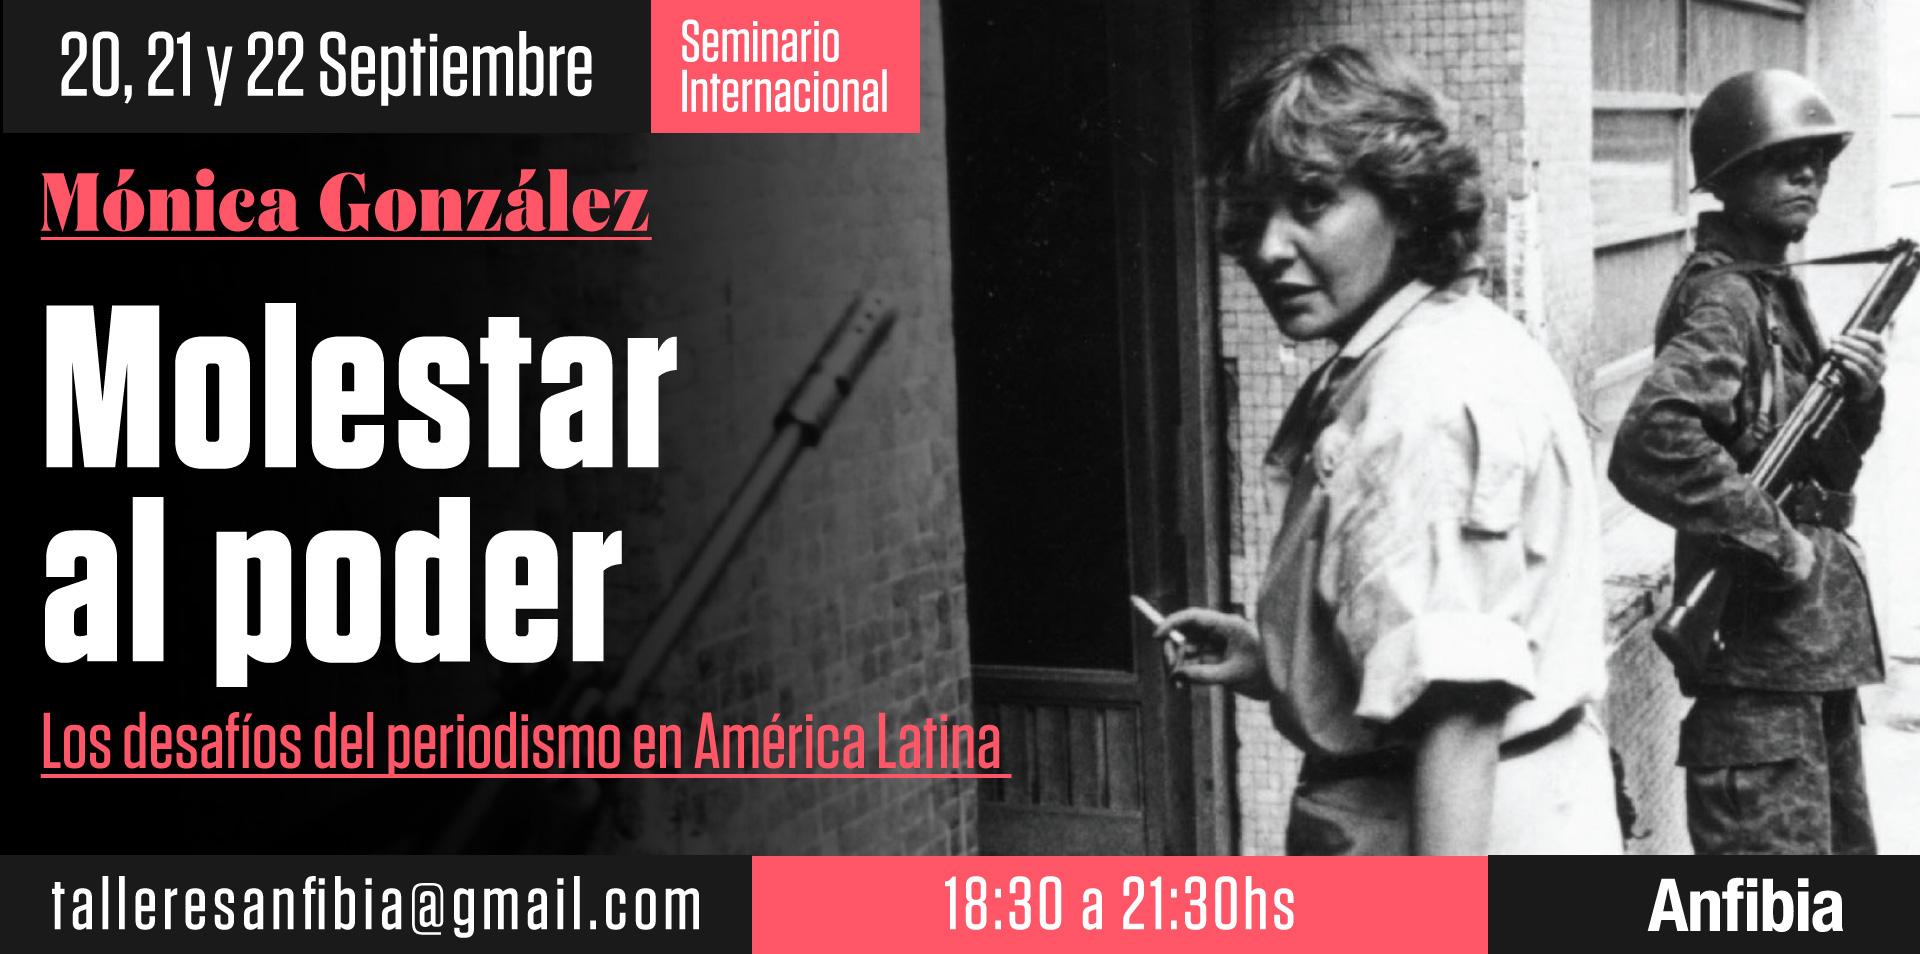 FLYER_monica_gonzalez_03